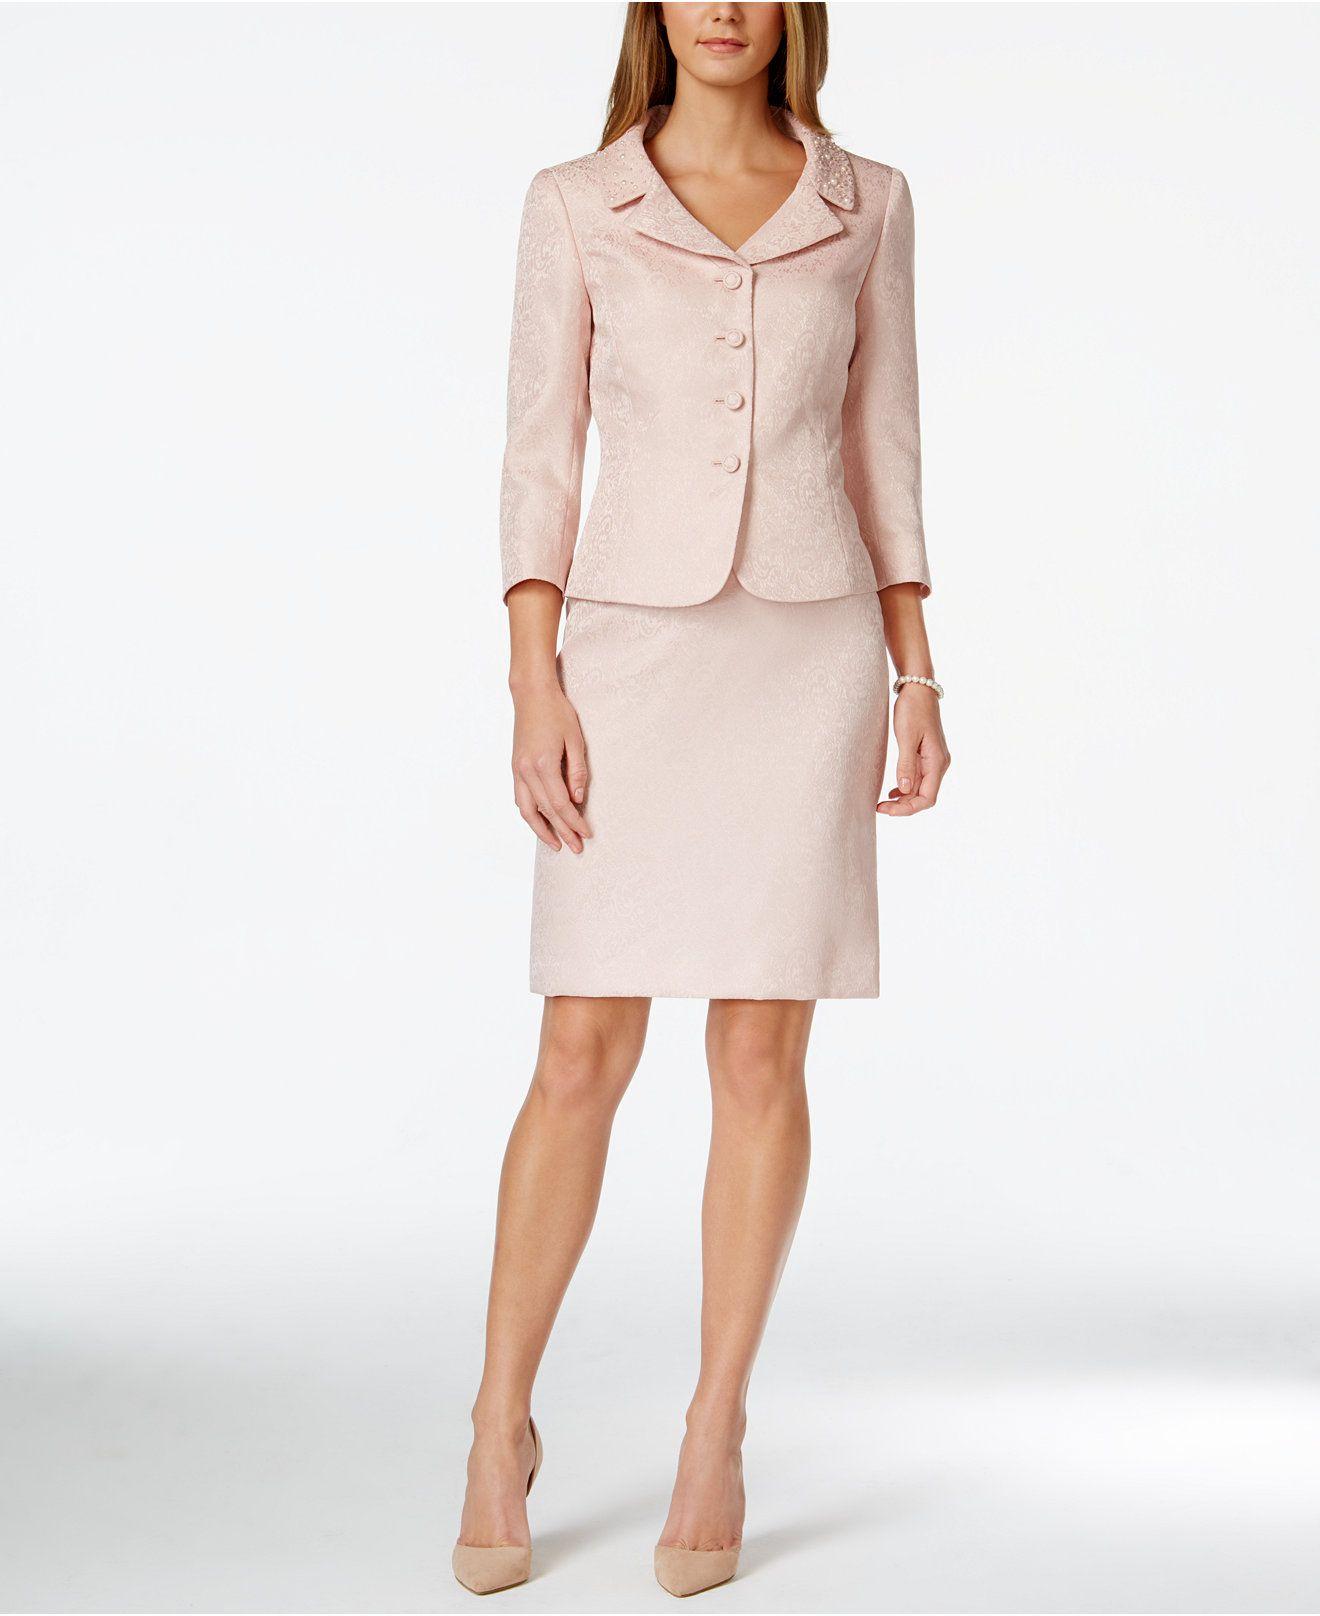 522ac733b5c9 Tahari ASL Jacquard Bead-Trim Jacket Skirt Suit - Wear to Work - Women -  Macy's